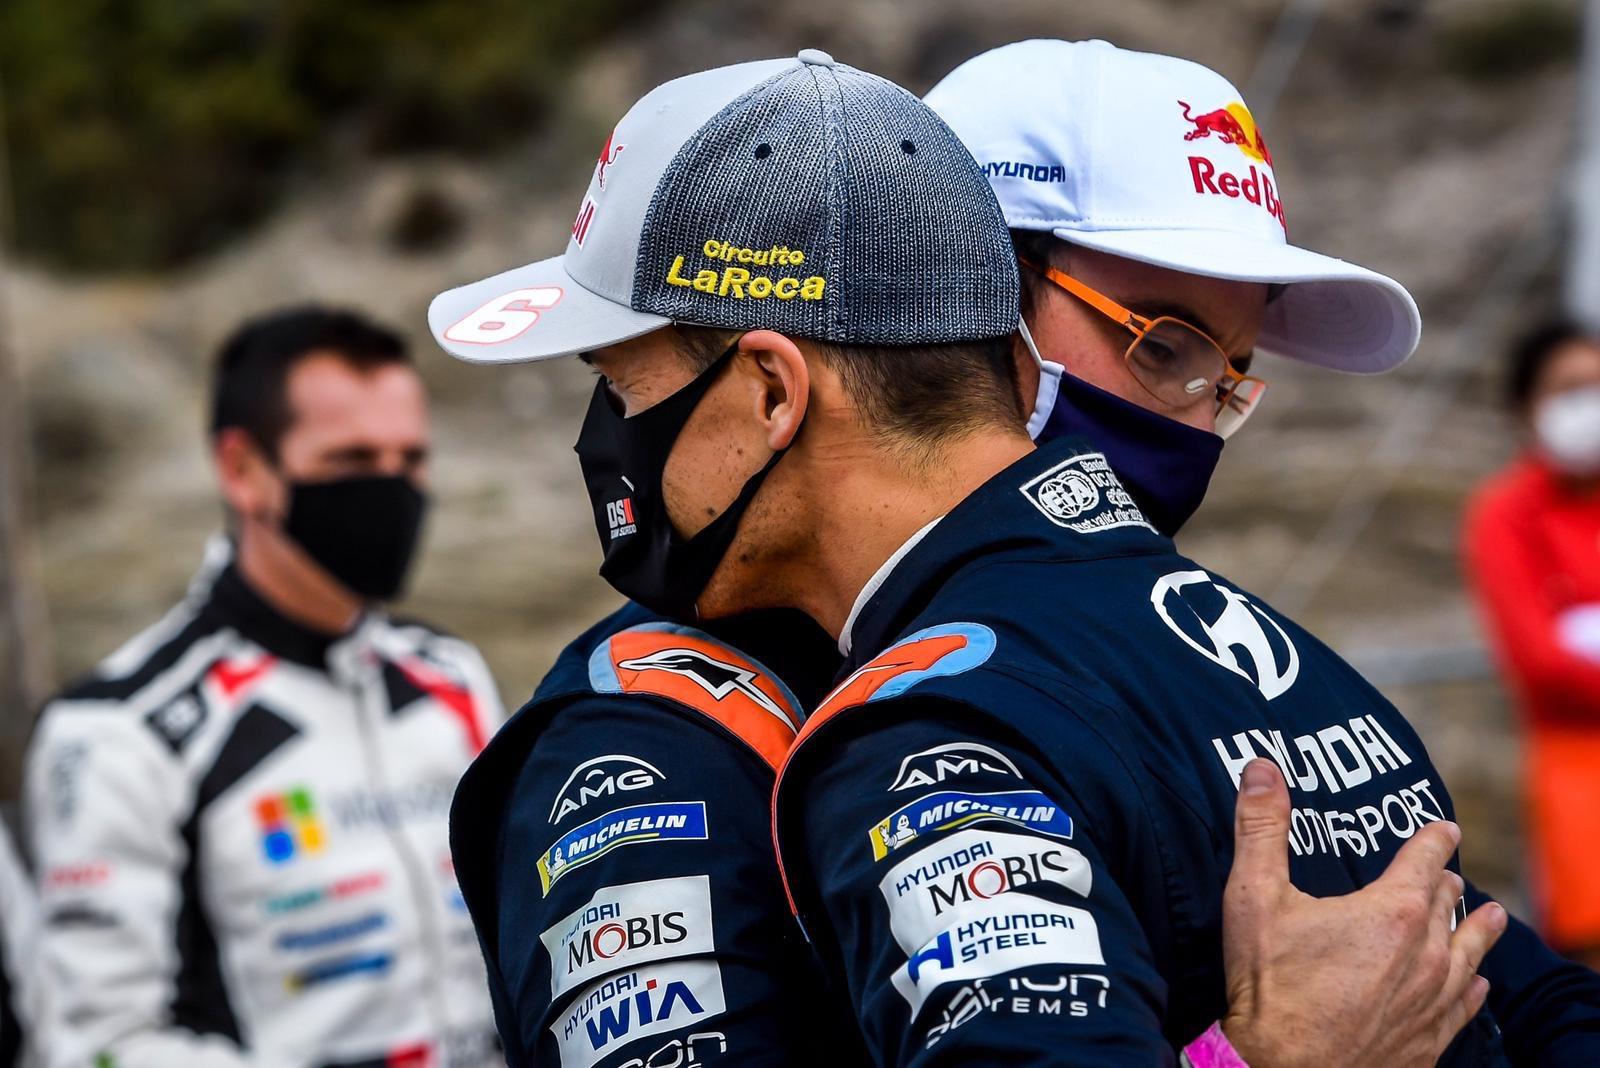 WRC: Rally d' Italia - Sardegna [8-10 Octubre] - Página 7 EkDAwipWAAArLvY?format=jpg&name=large